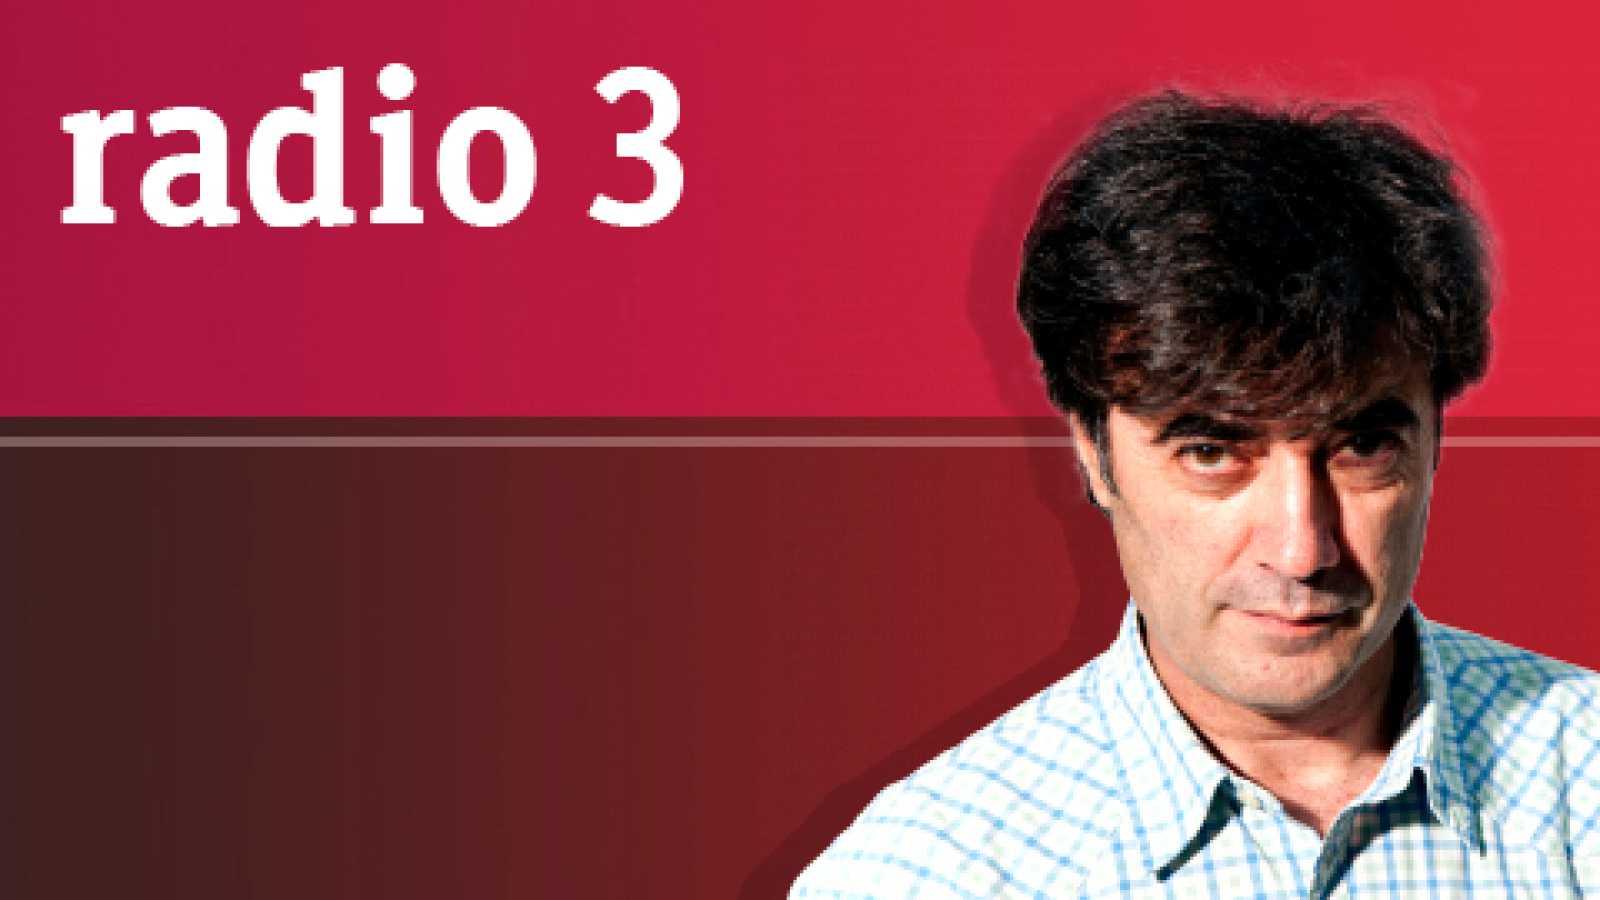 Siglo 21 - Amatria - 24/05/17 - escuchar ahora